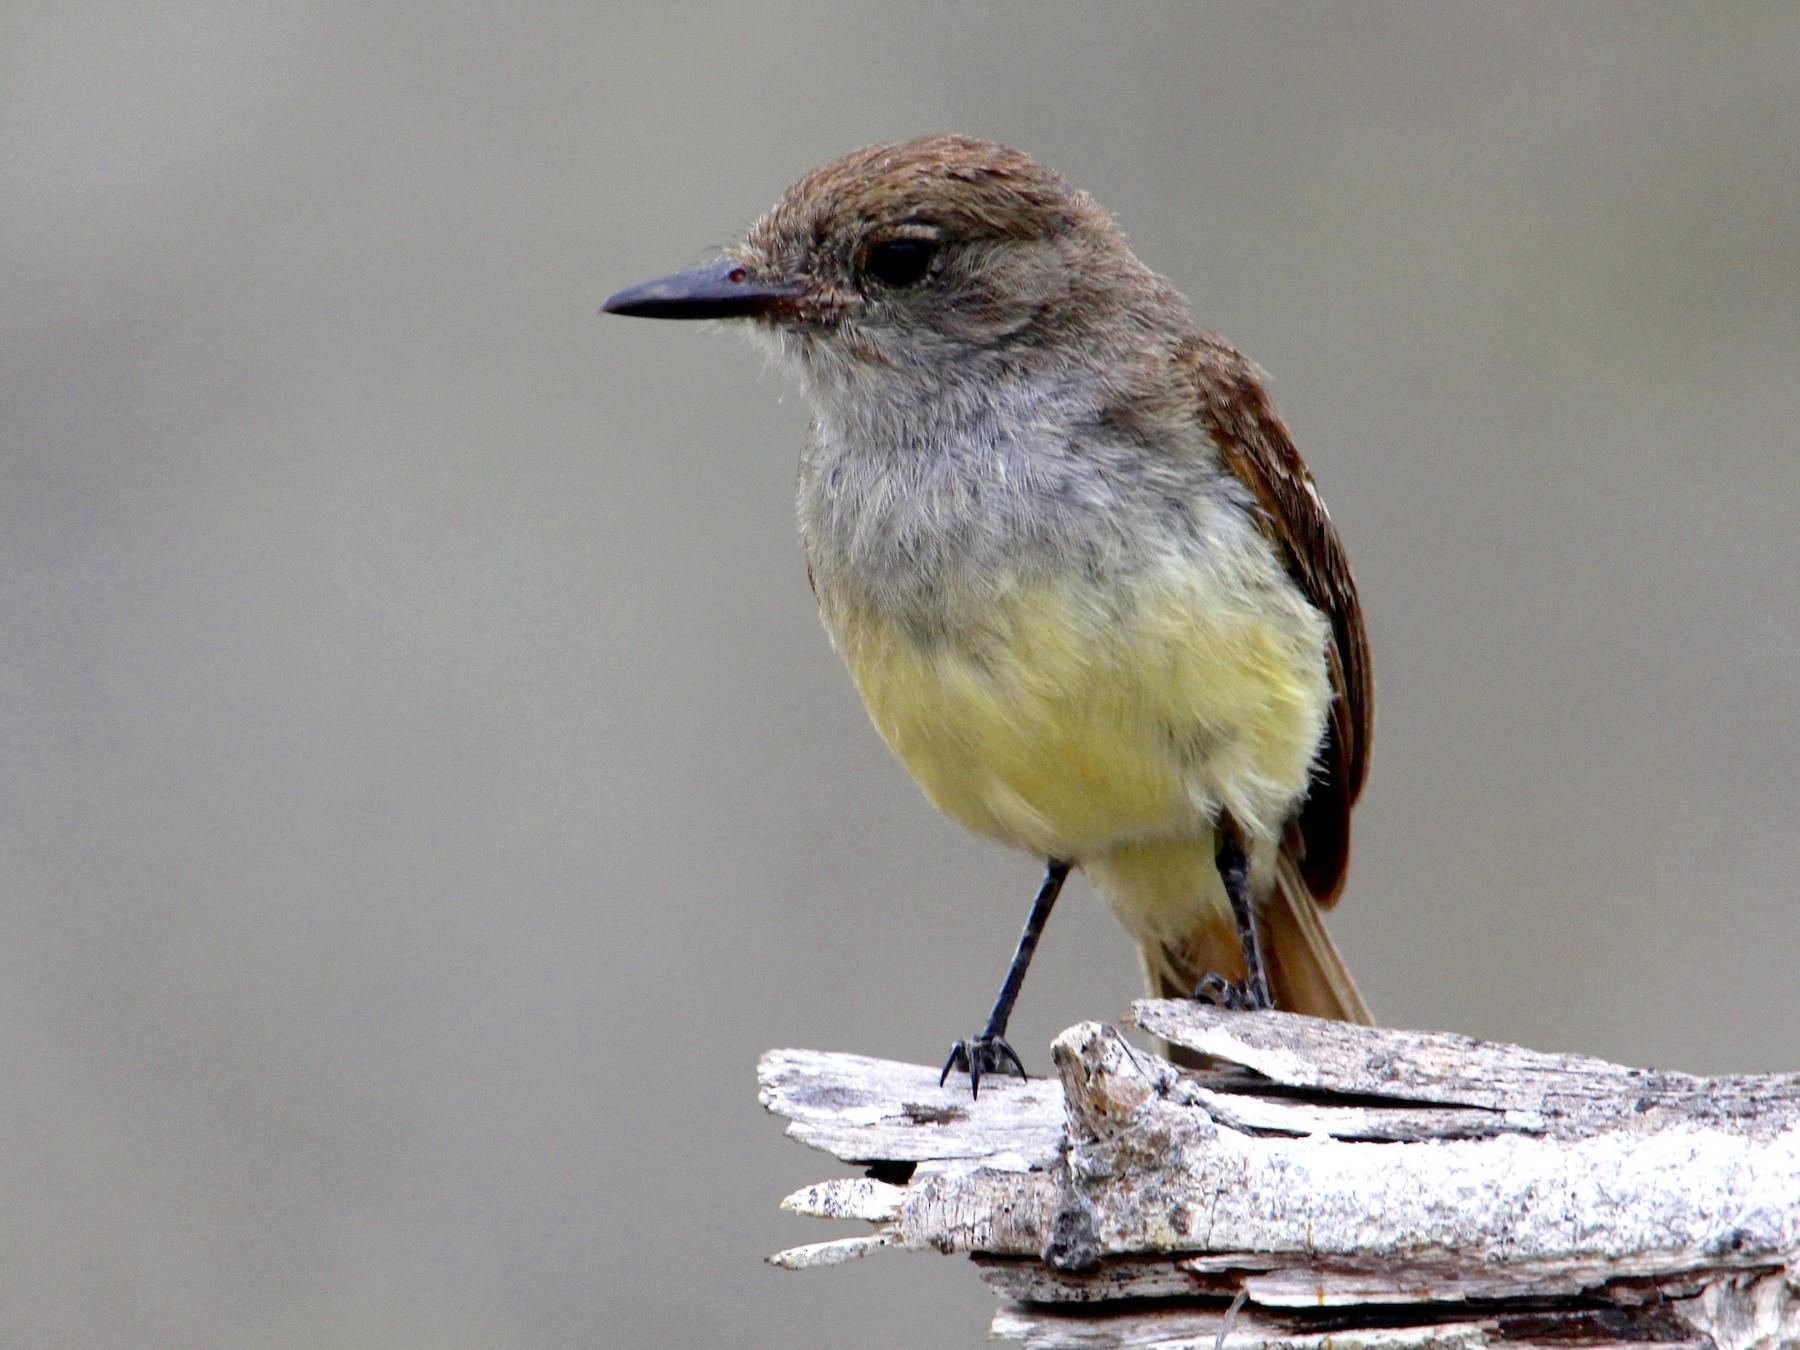 Galapagos Flycatcher - Robbin Mallett